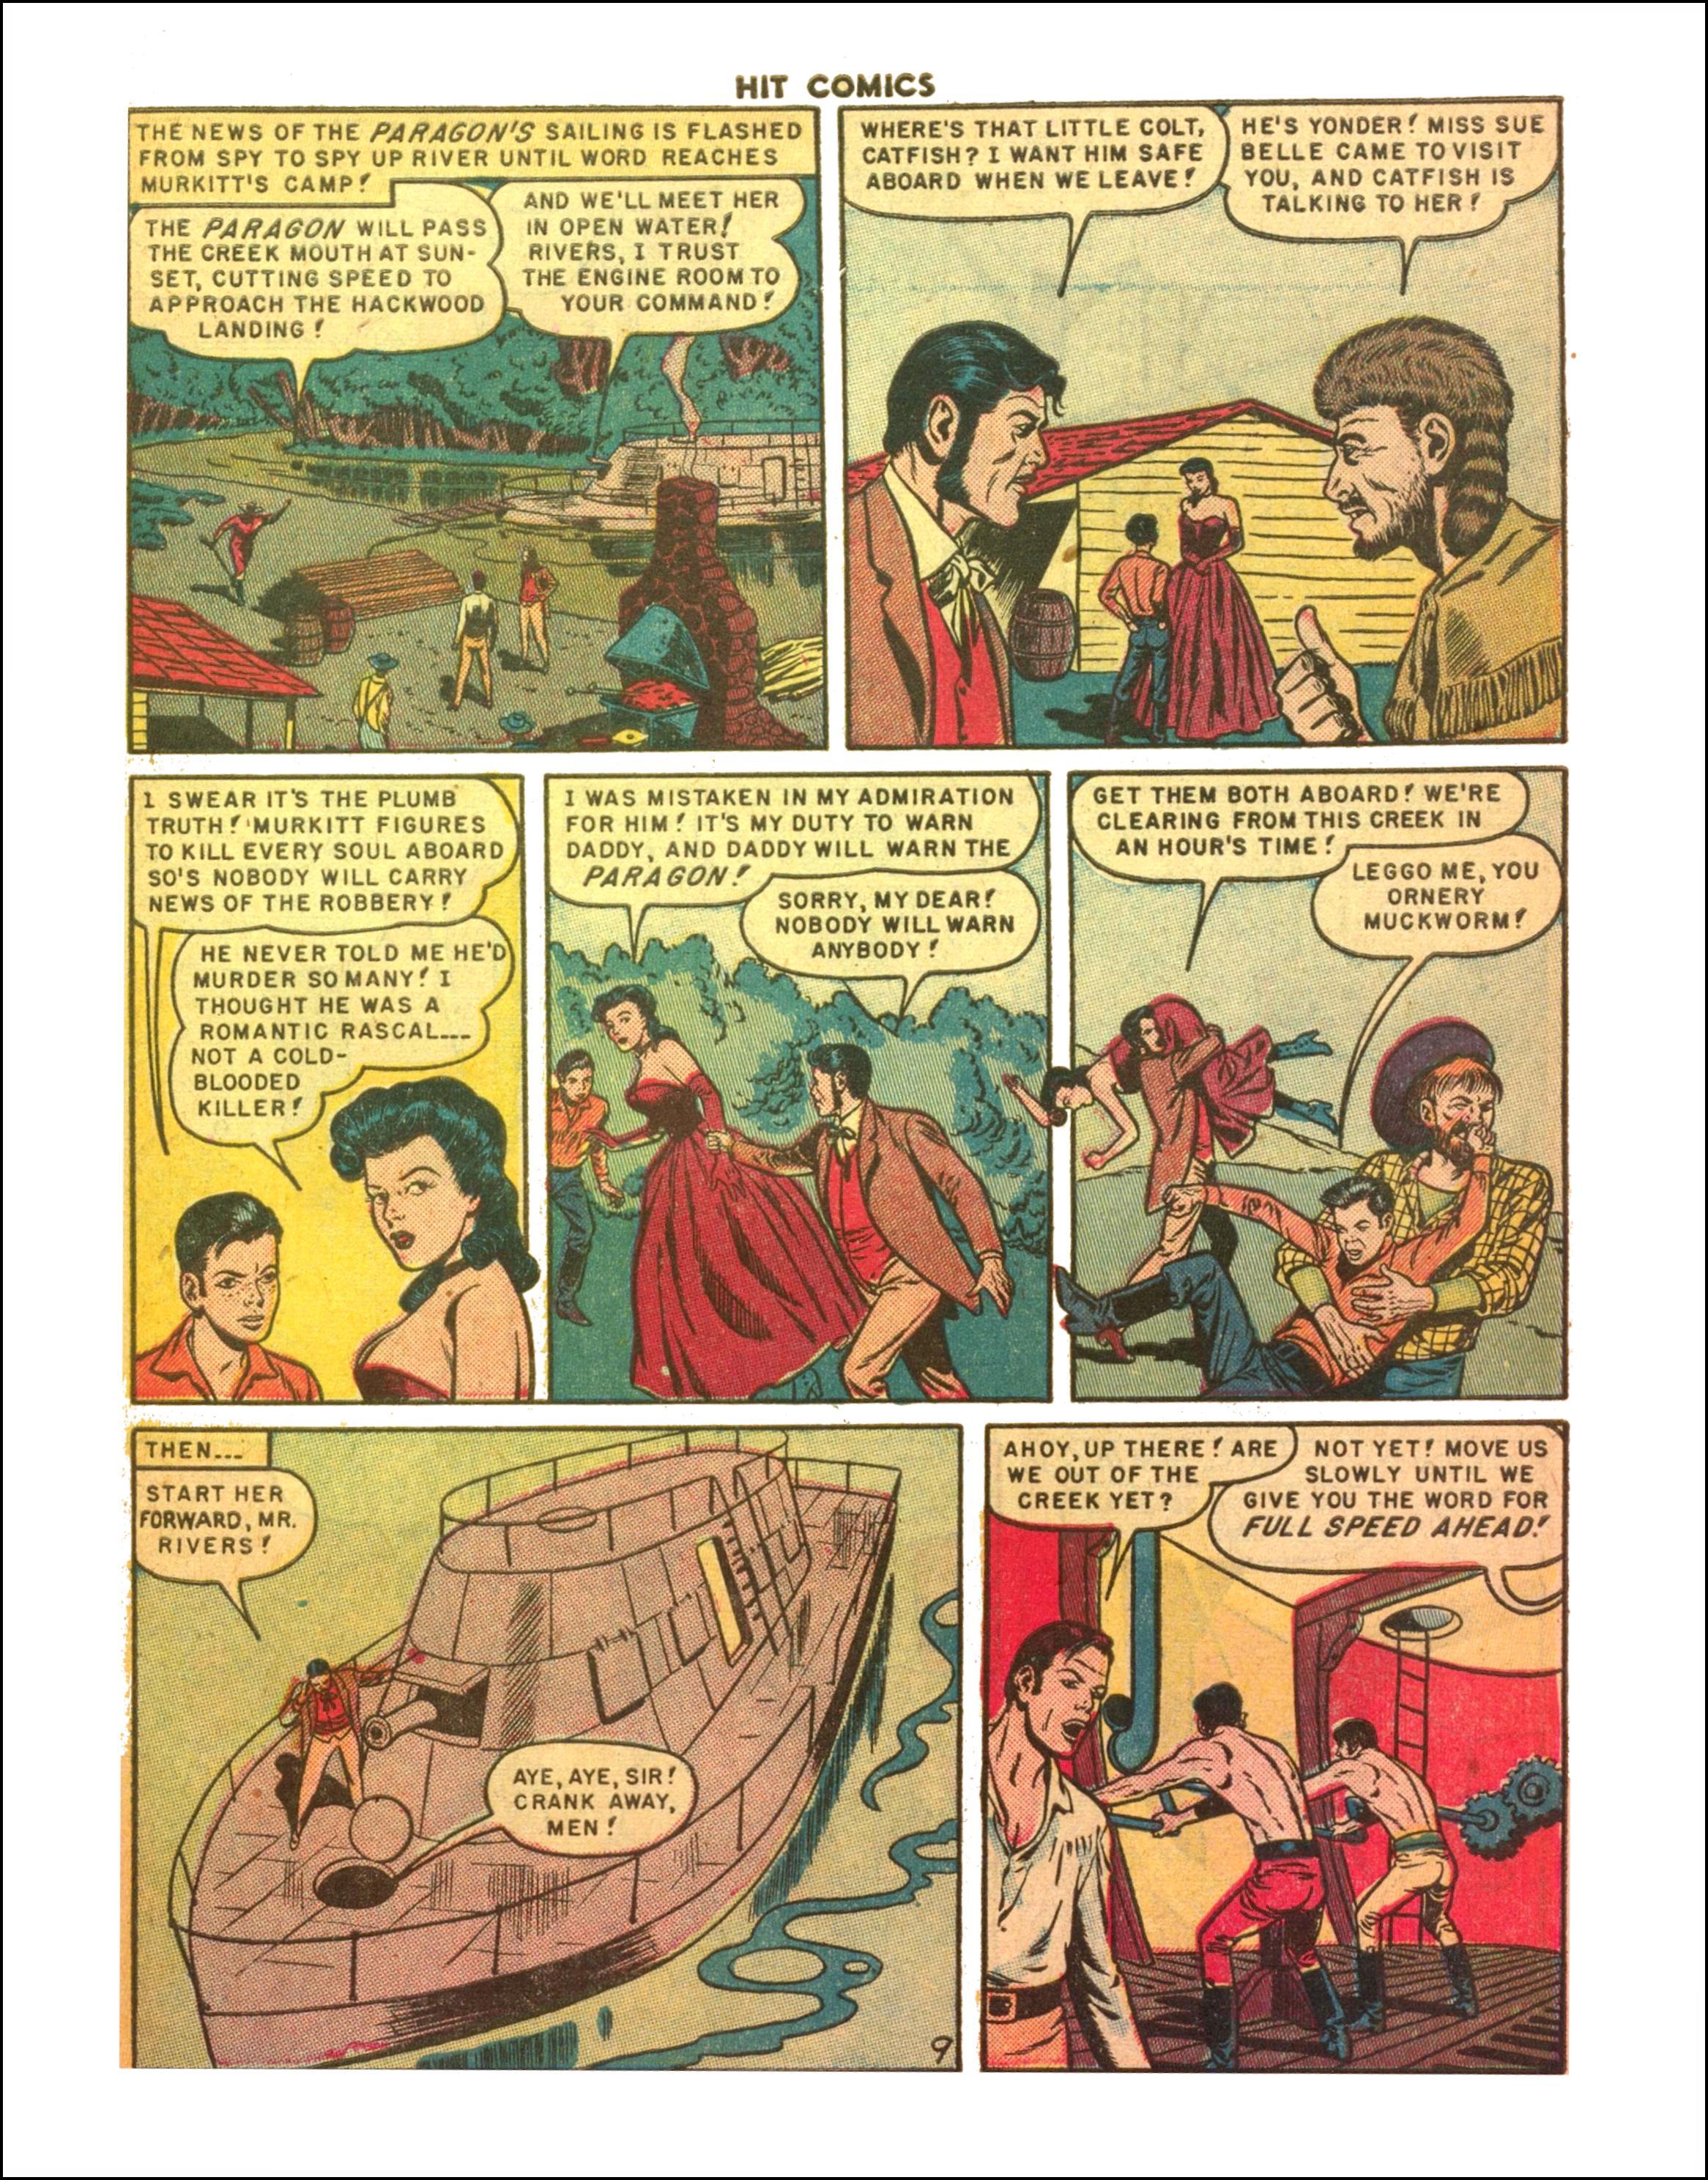 Read online Hit Comics comic -  Issue #65 - 11